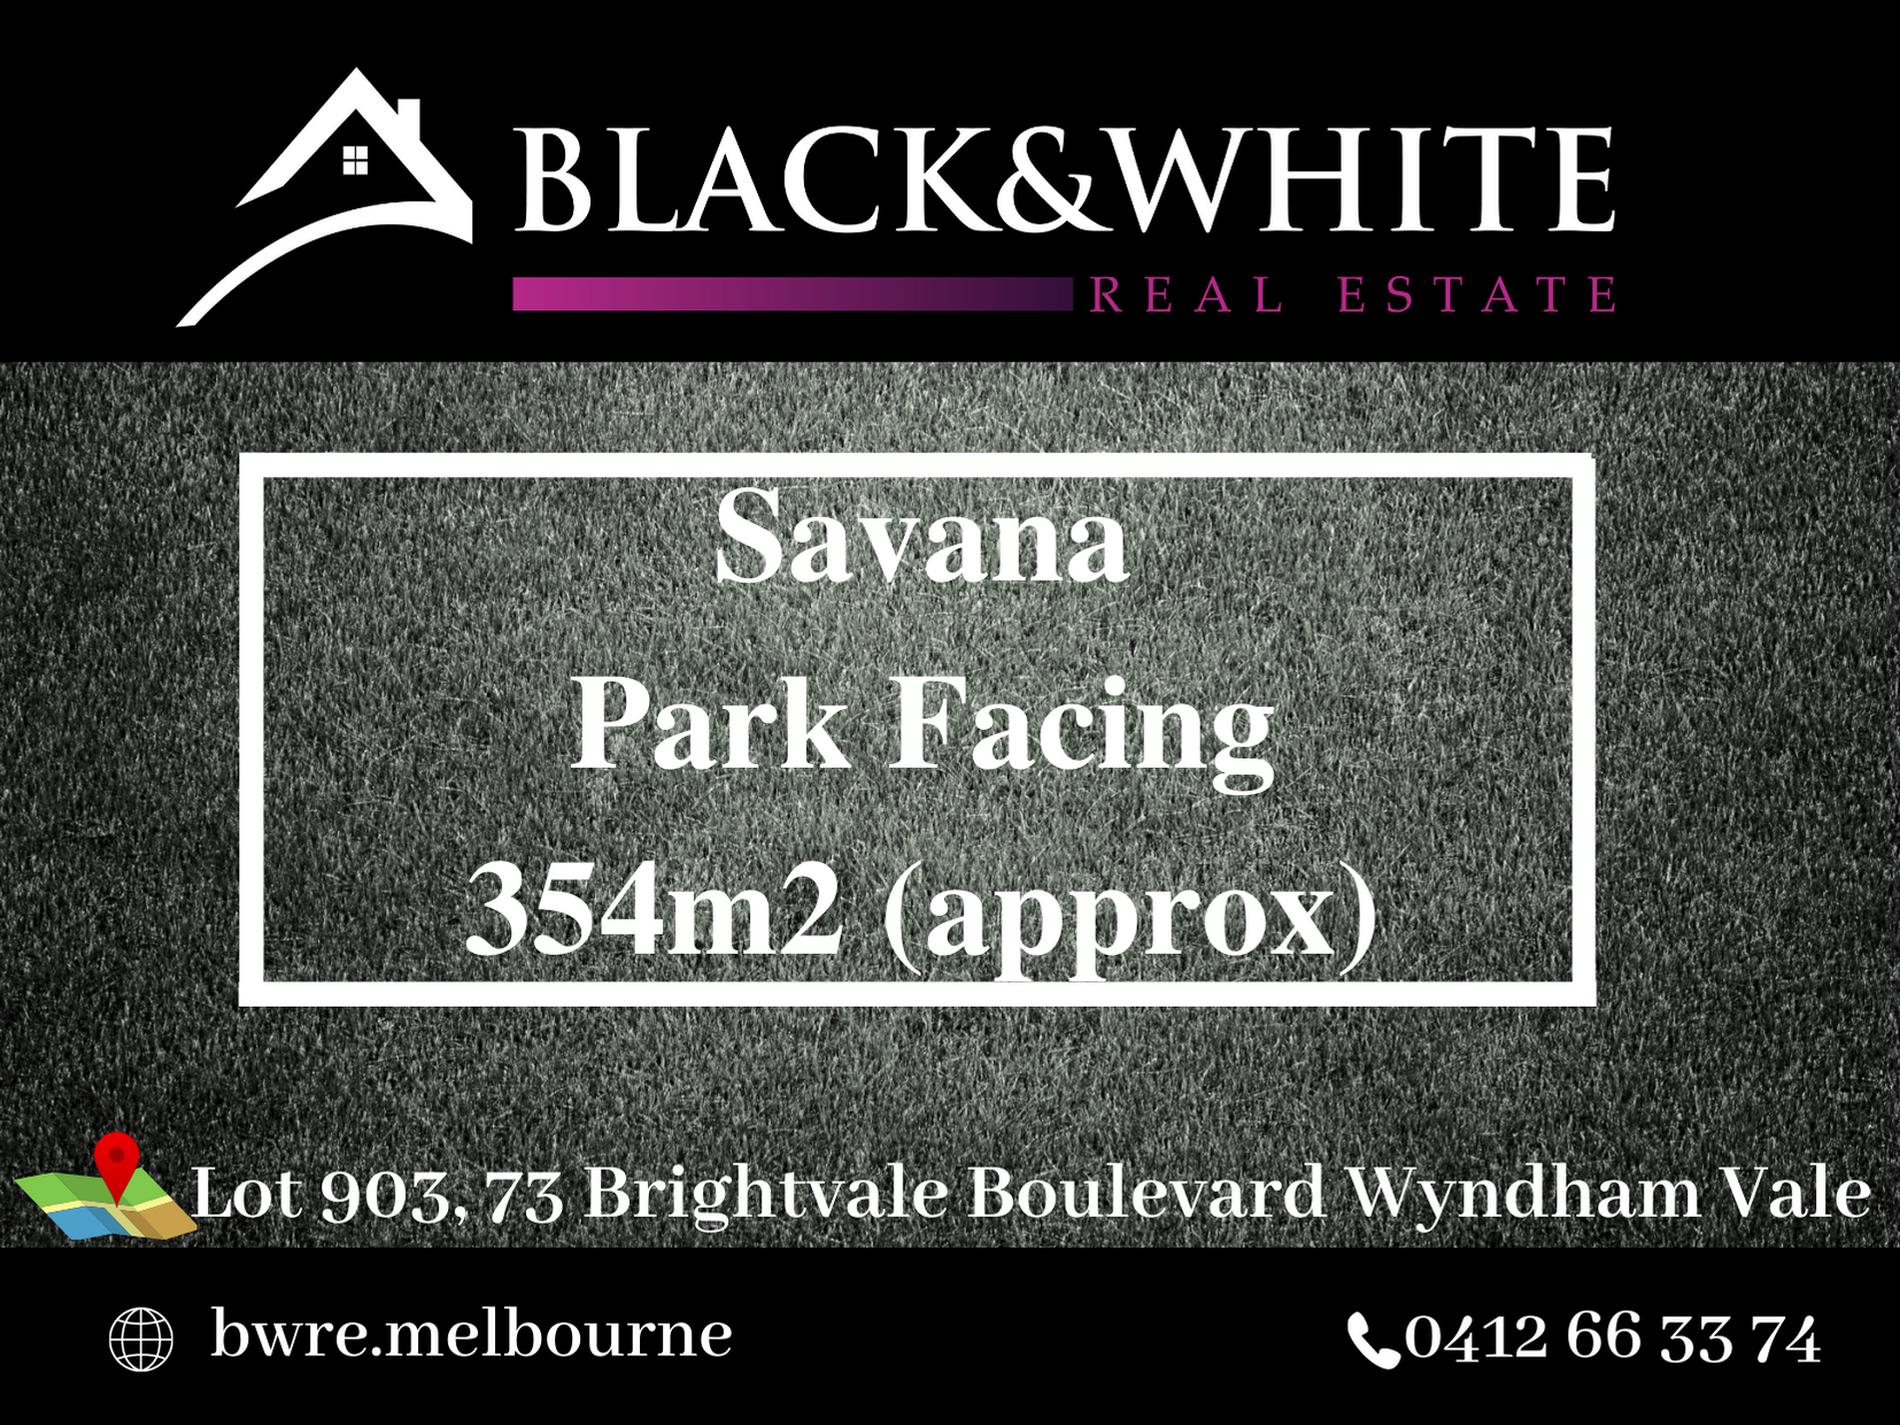 73 Brightvale Boulevard, Wyndham Vale